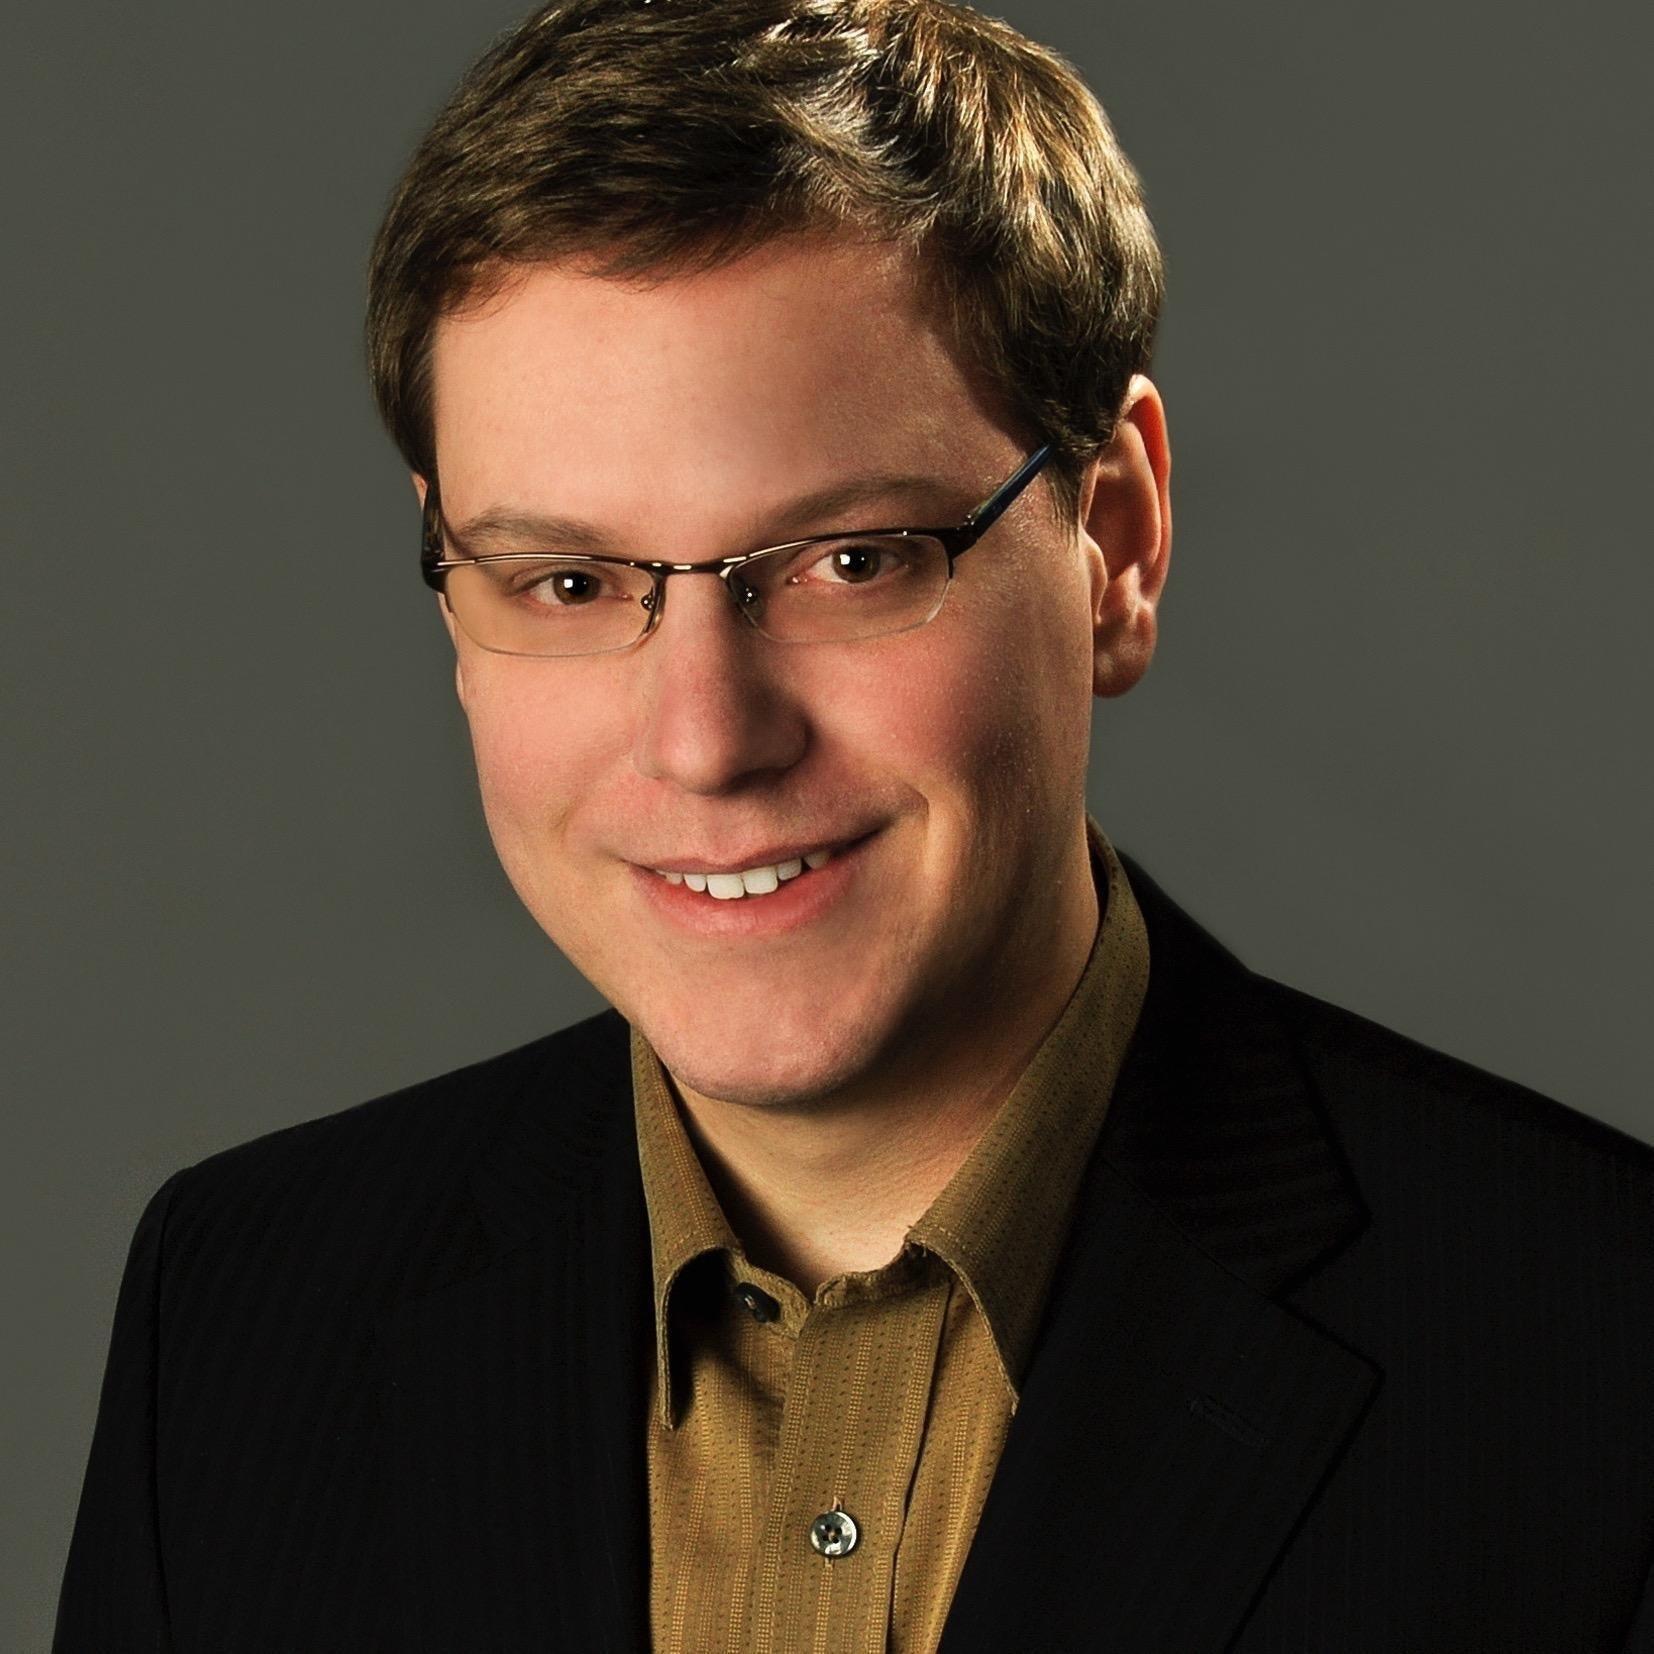 Nicolai Kamenzky